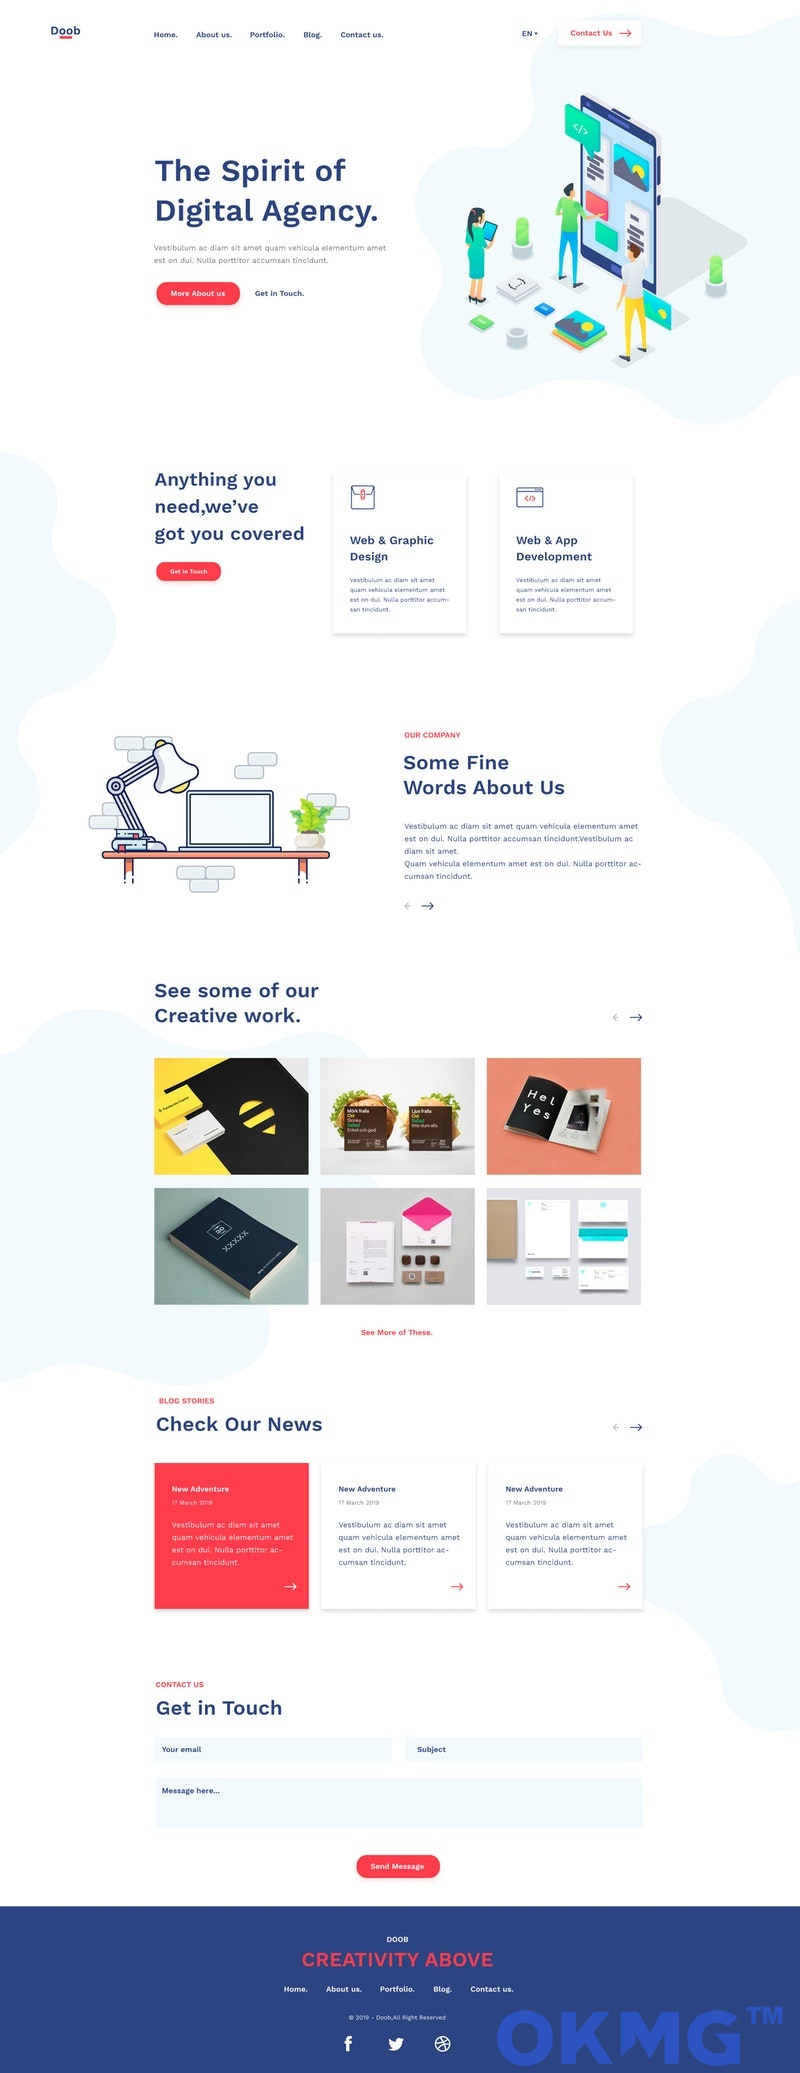 Doob-免费代理商HTML模板